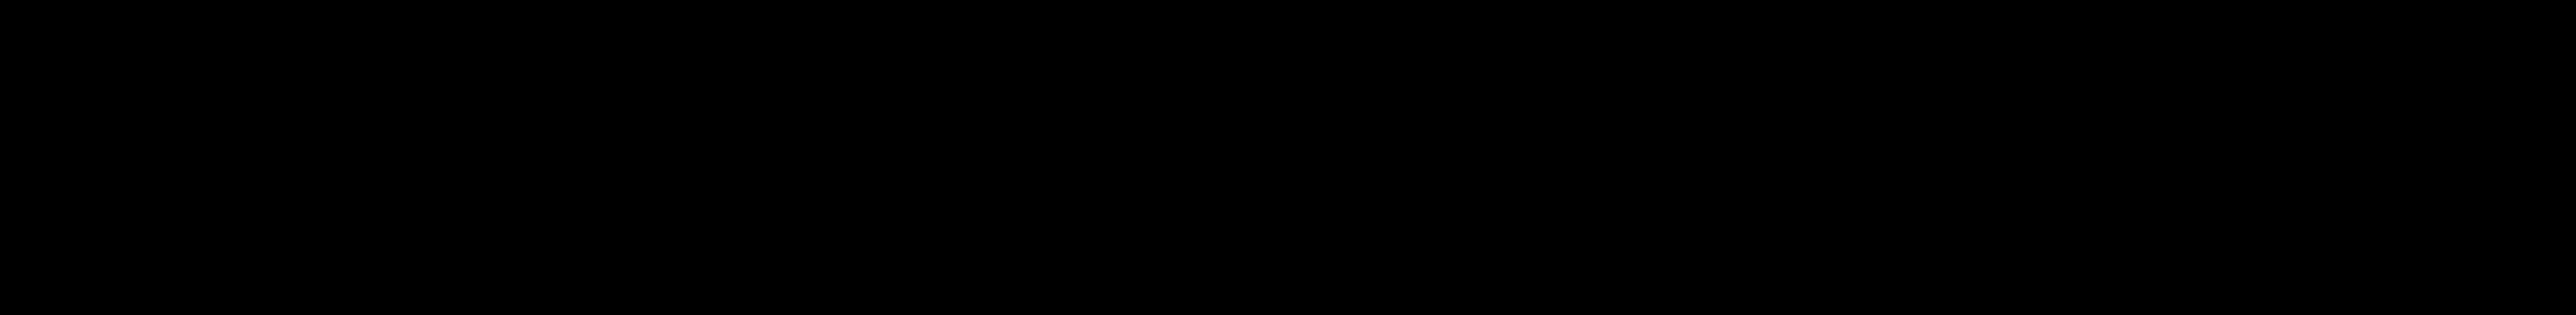 spacex logo 1 - SpaceX Logo